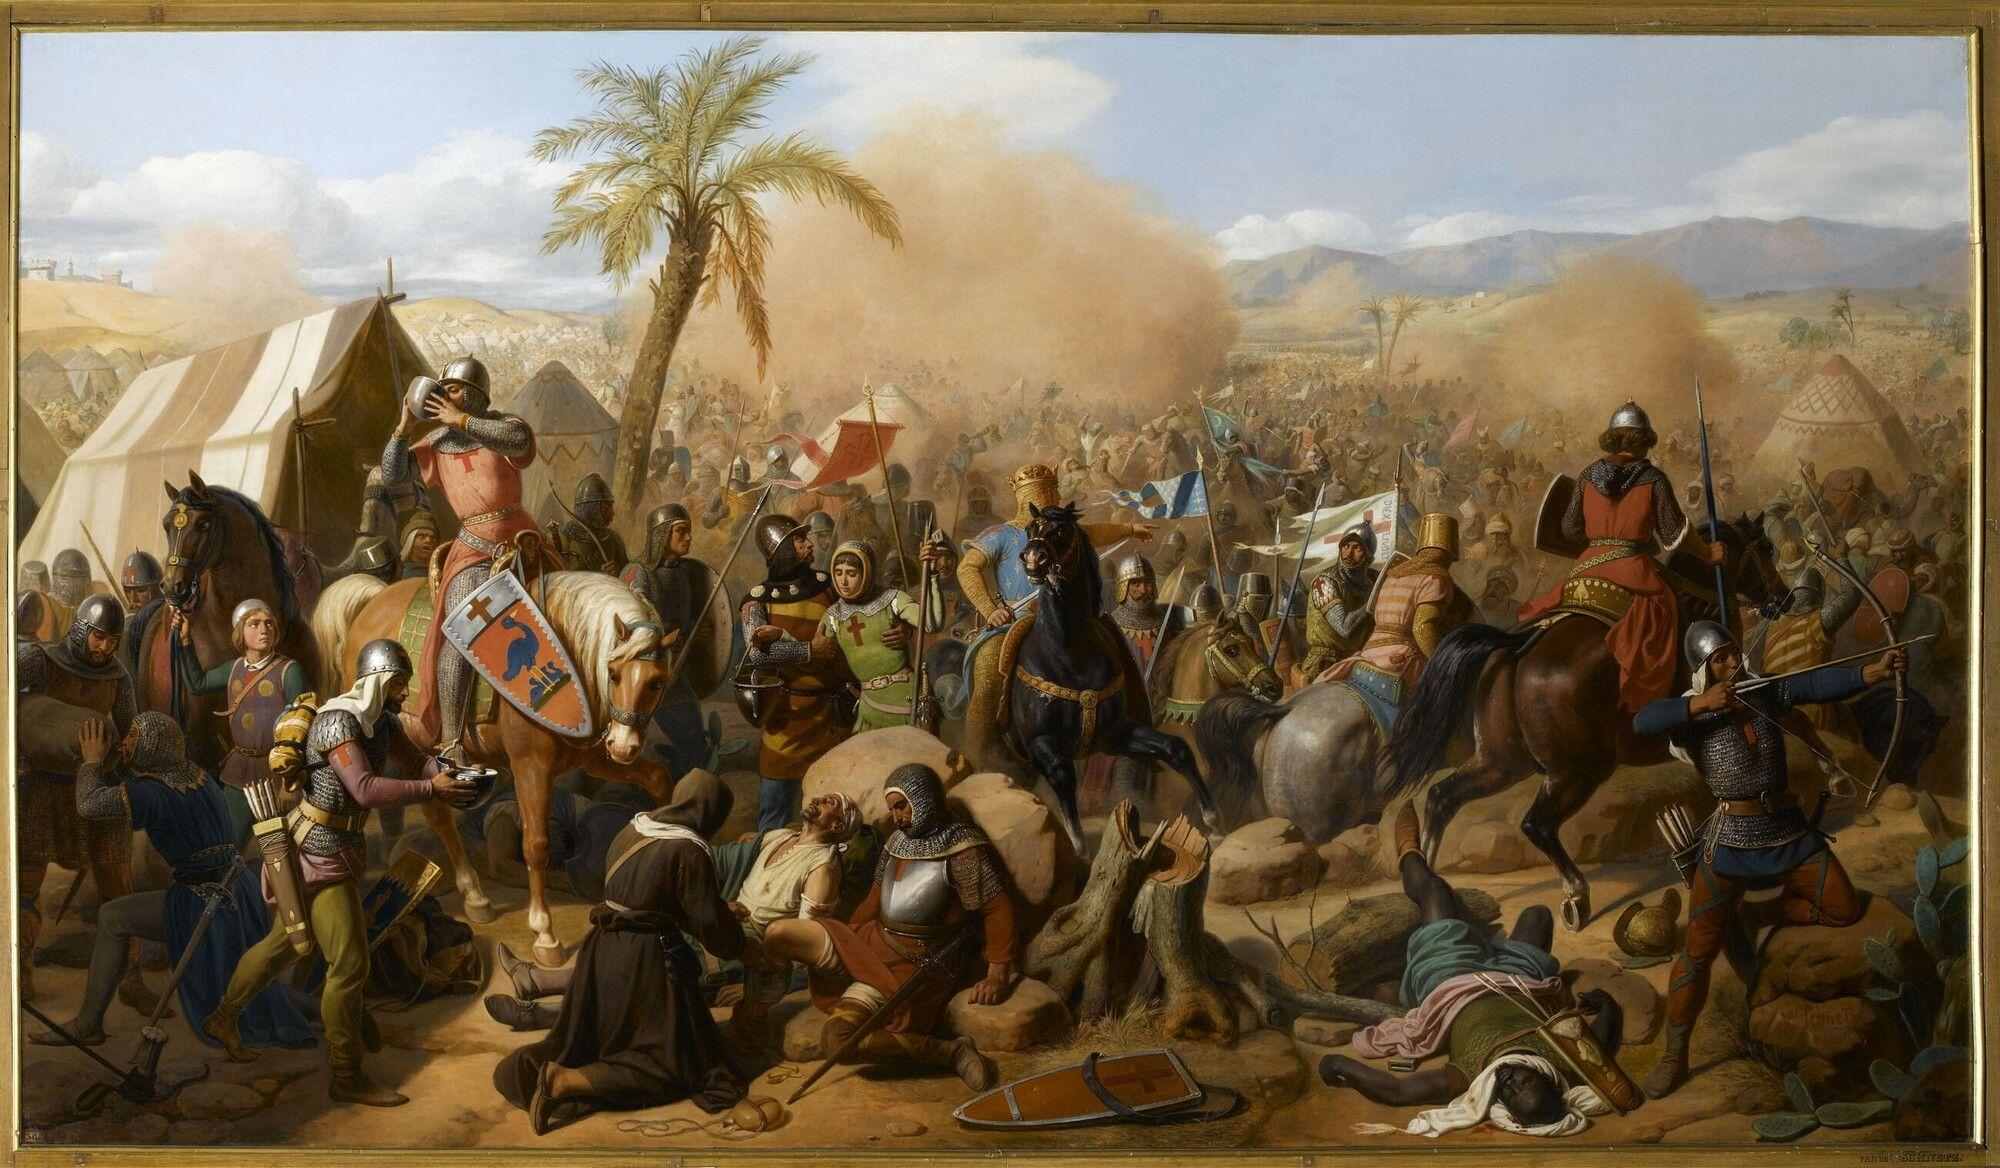 The Battle of Ascalon : 12 VIII 1099 AD, by Jean Victor Schnetz. |  Cruzadas, Tropas, Templarios